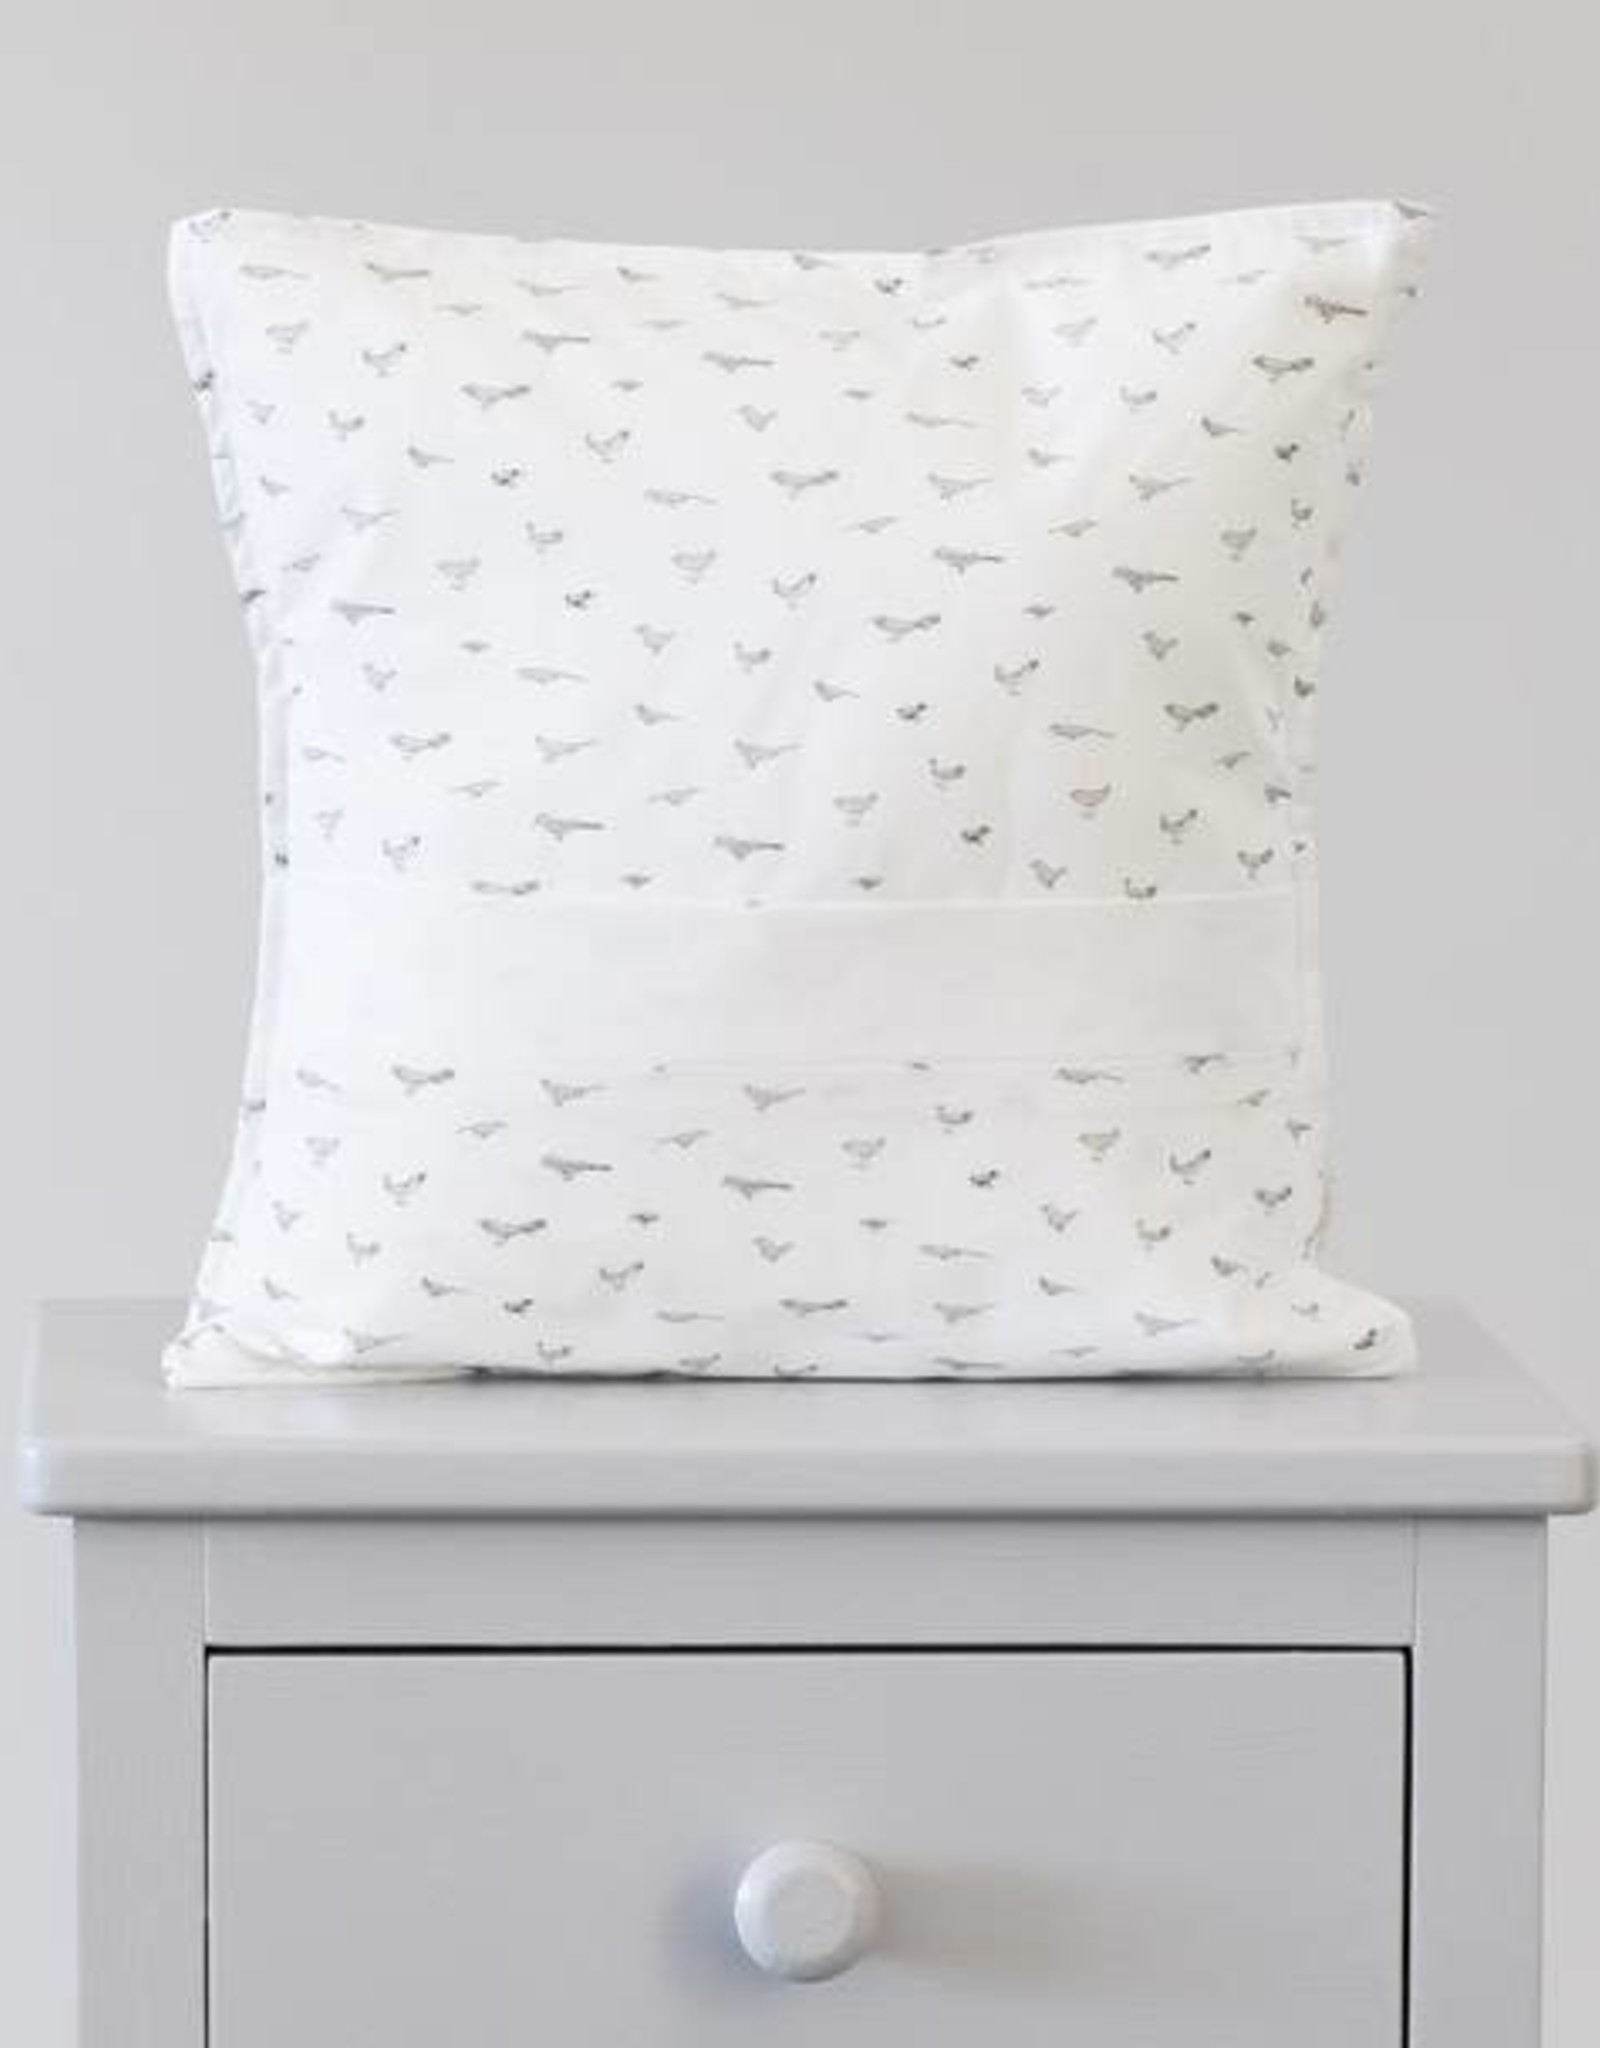 Pillowcase and pillow